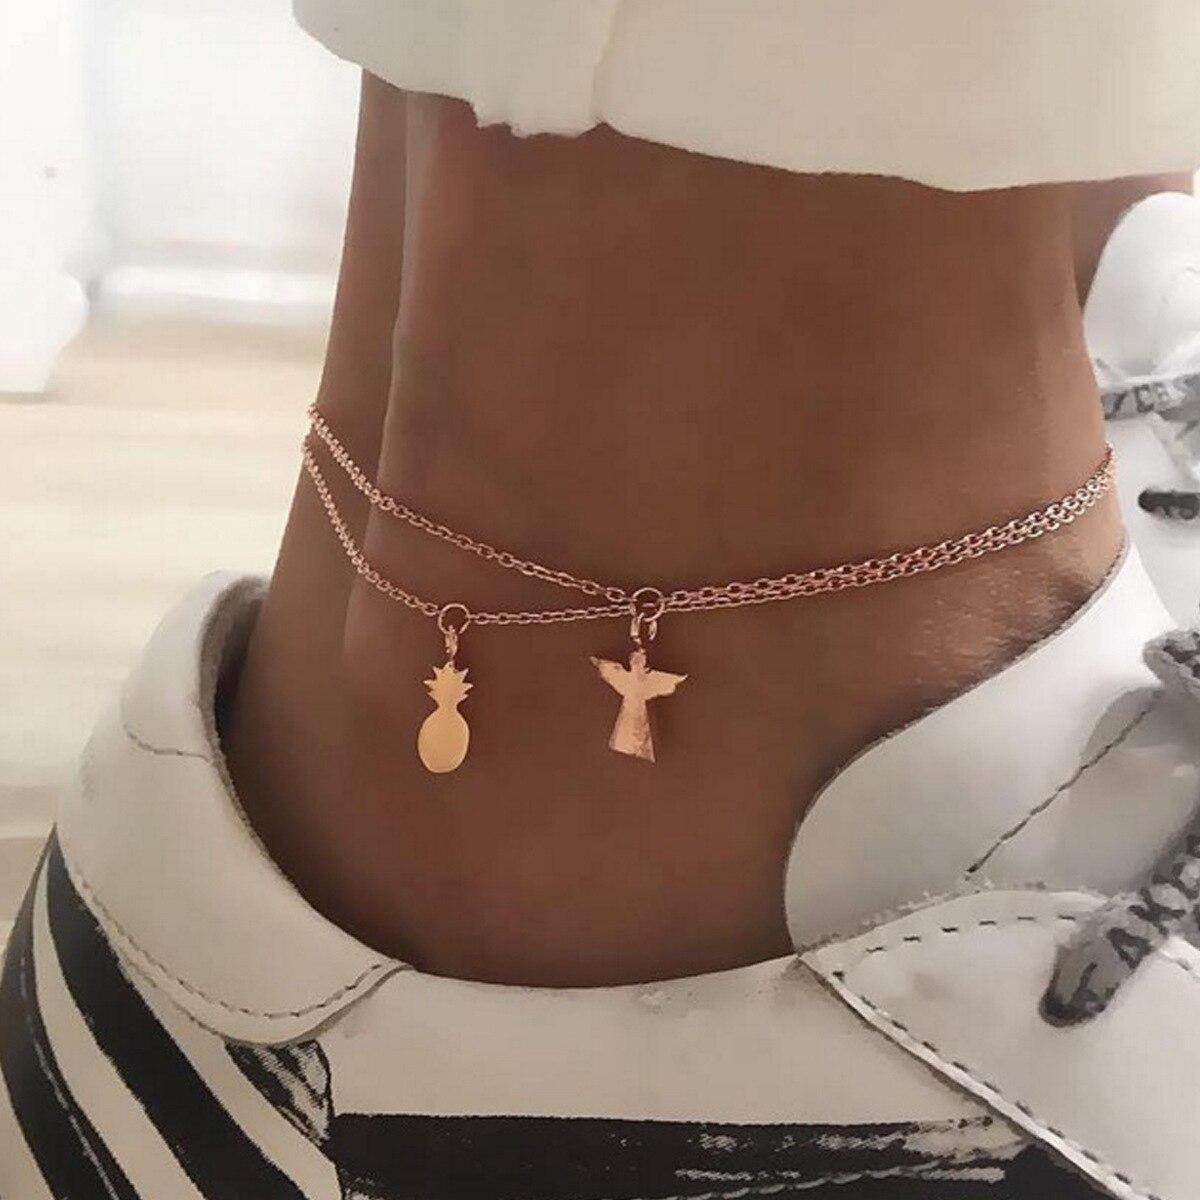 Fashion retro ethnic style ladies alloy pineapple angel pendant anklet set 2 pieces,